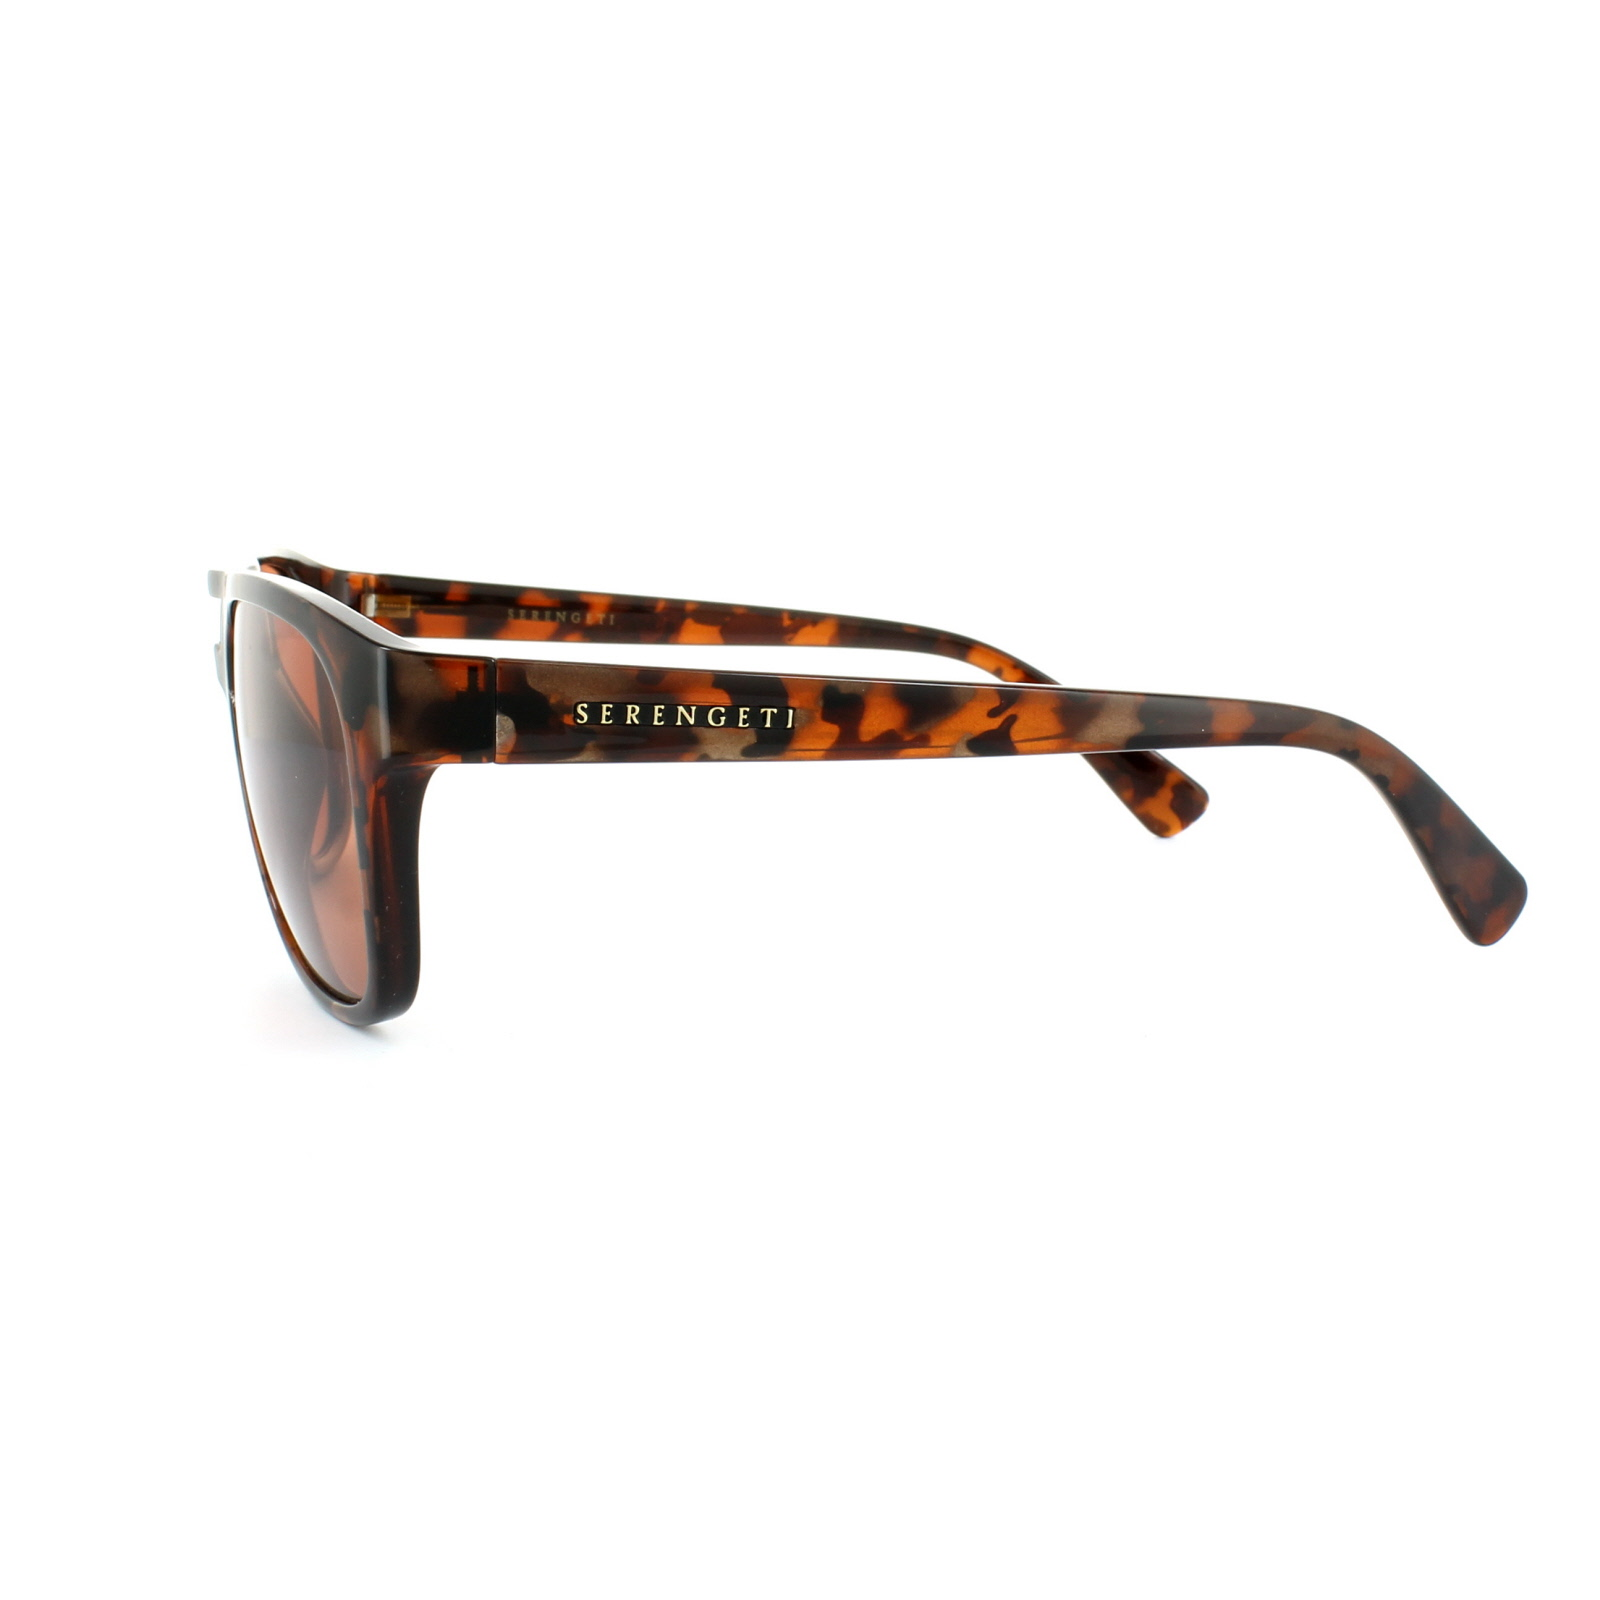 0cda193534 Sentinel Serengeti Sunglasses Tommaso 7958 Shiny Taupe Tortoise Drivers  Brown